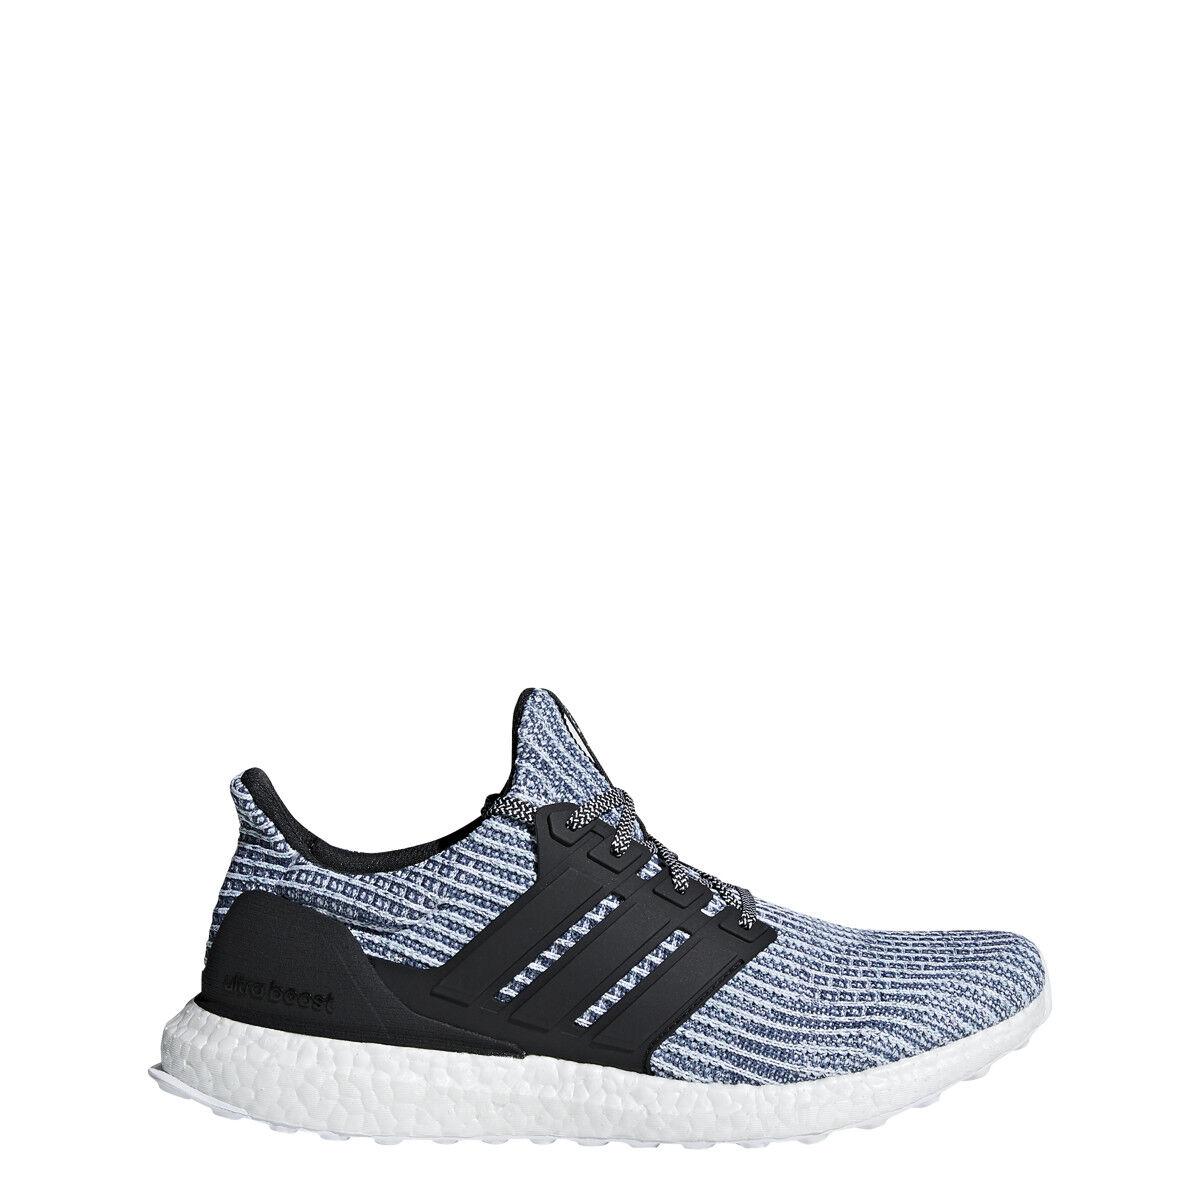 Men's Adidas Ultraboost Running Shoe White/Carbon/Blue Spirit